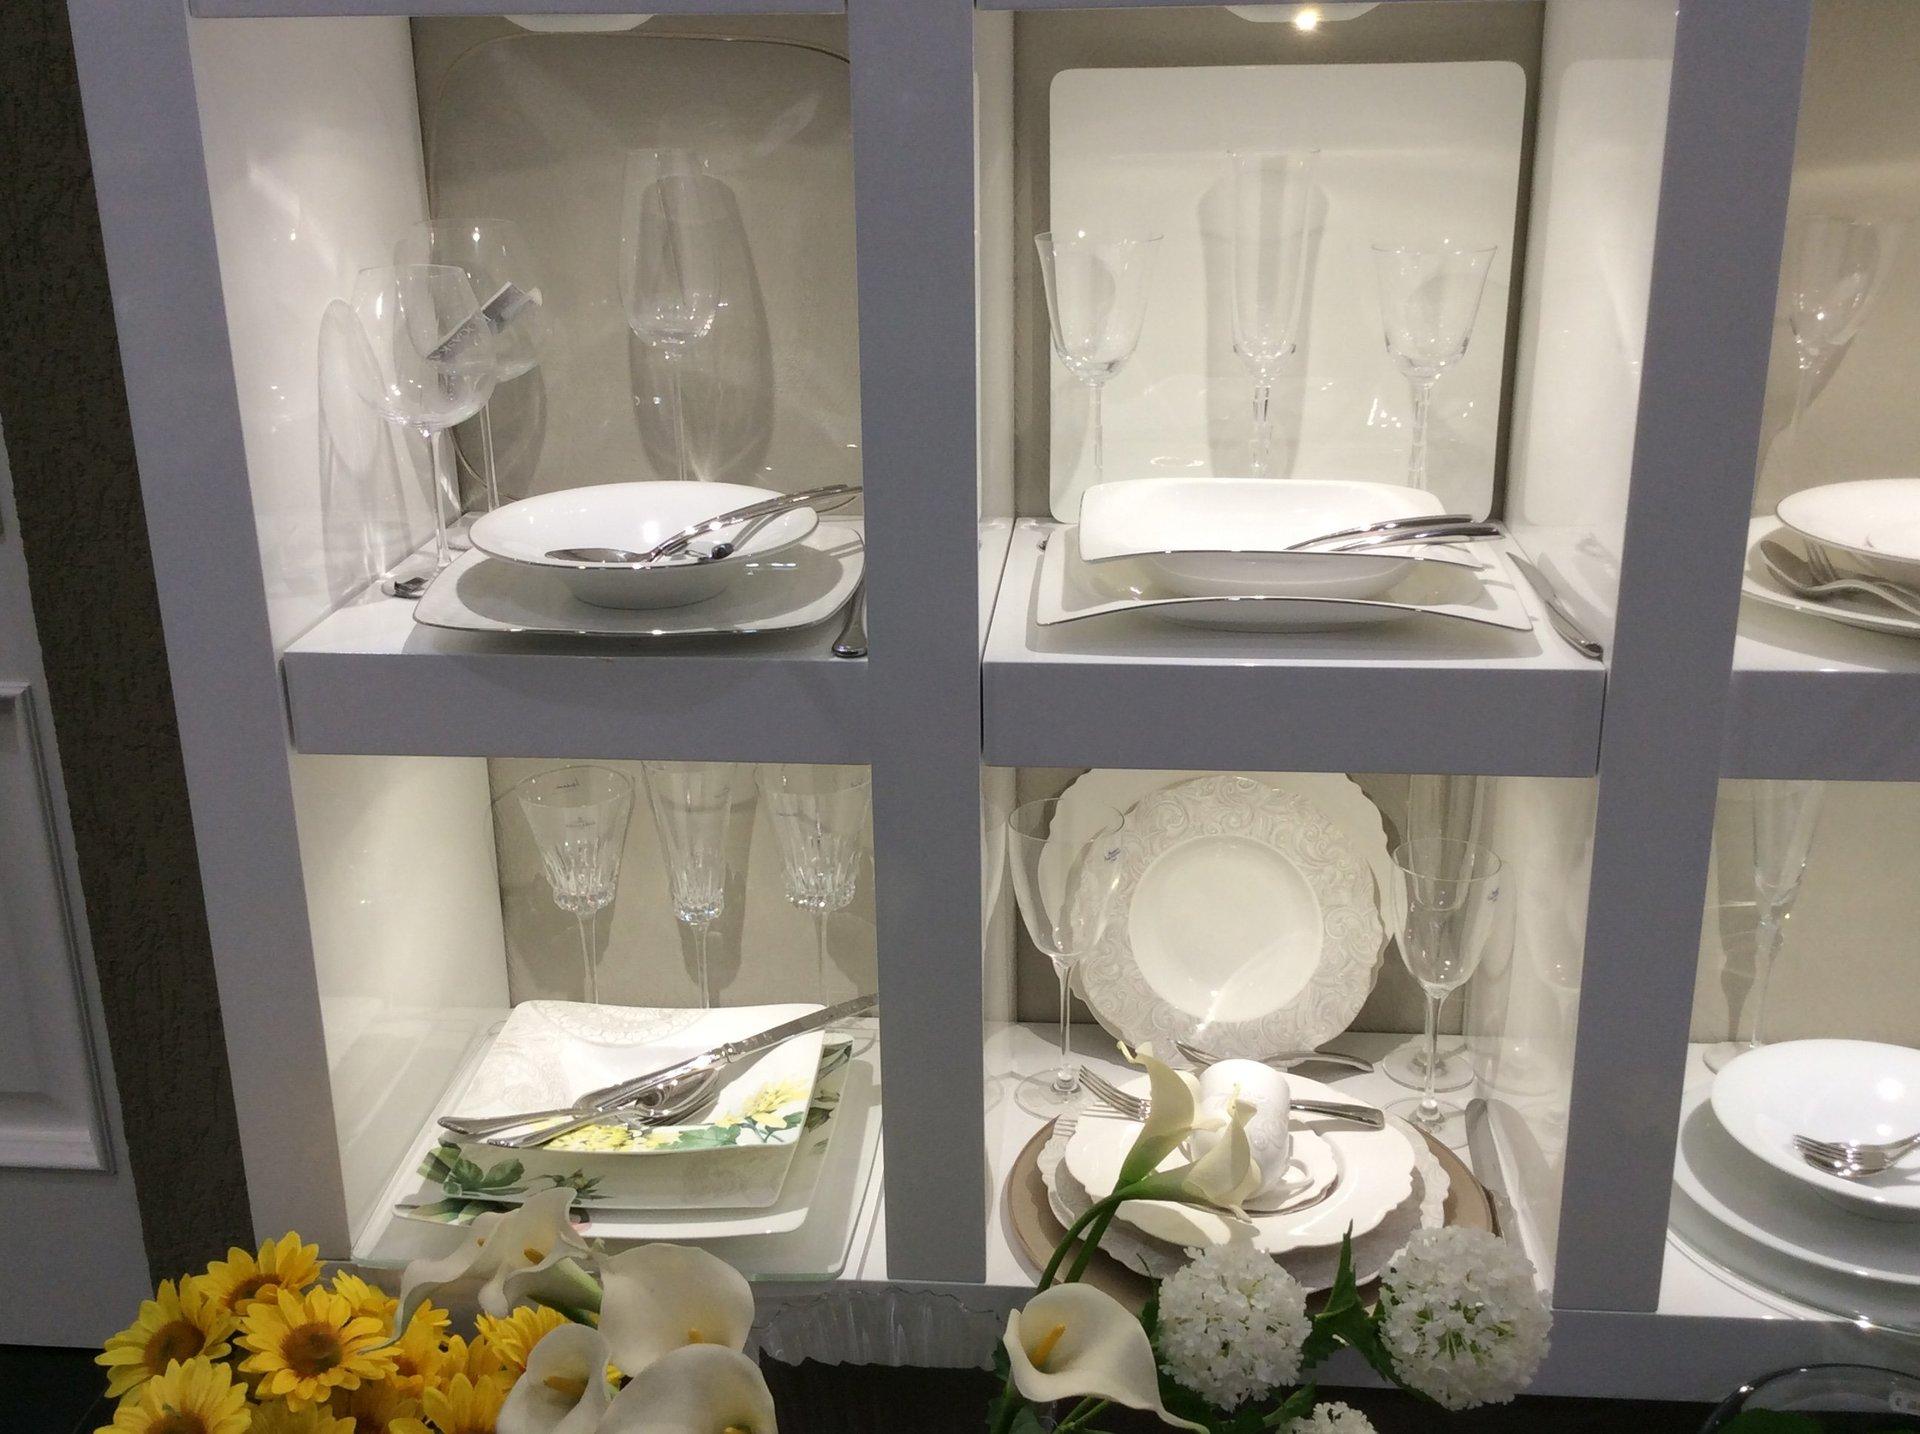 piatti in porcellana pregiati